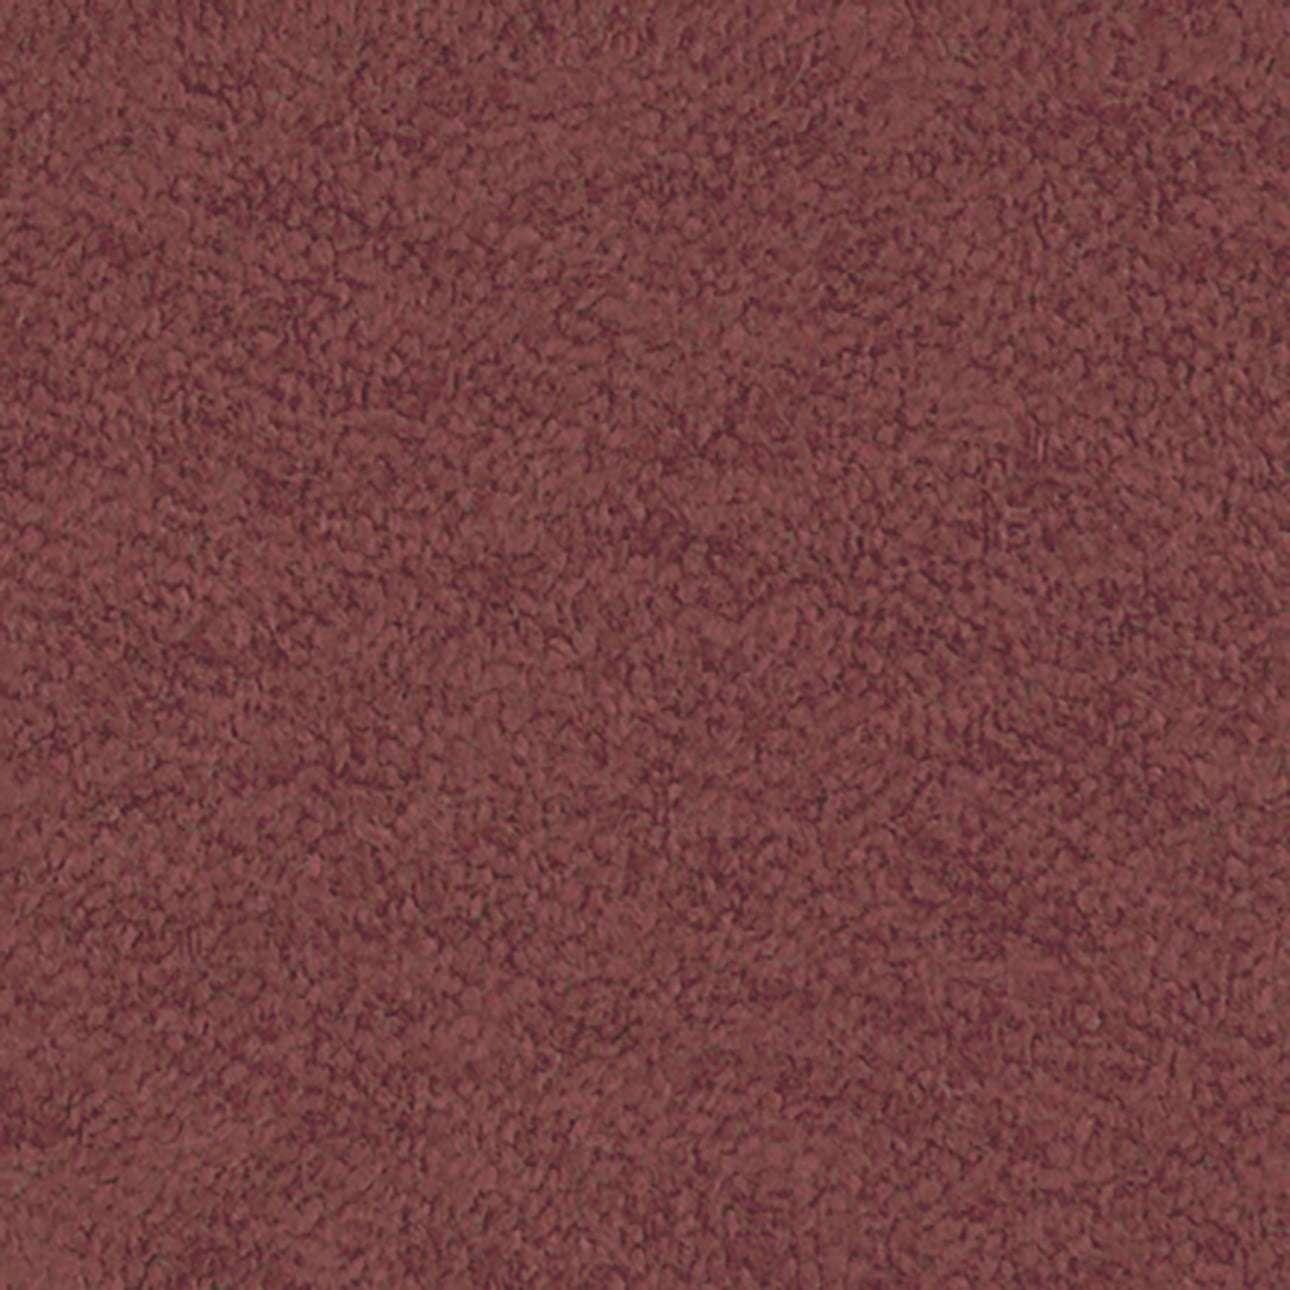 Poszewka na podłokietnik Beddinge w kolekcji Living, tkanina: 100-99